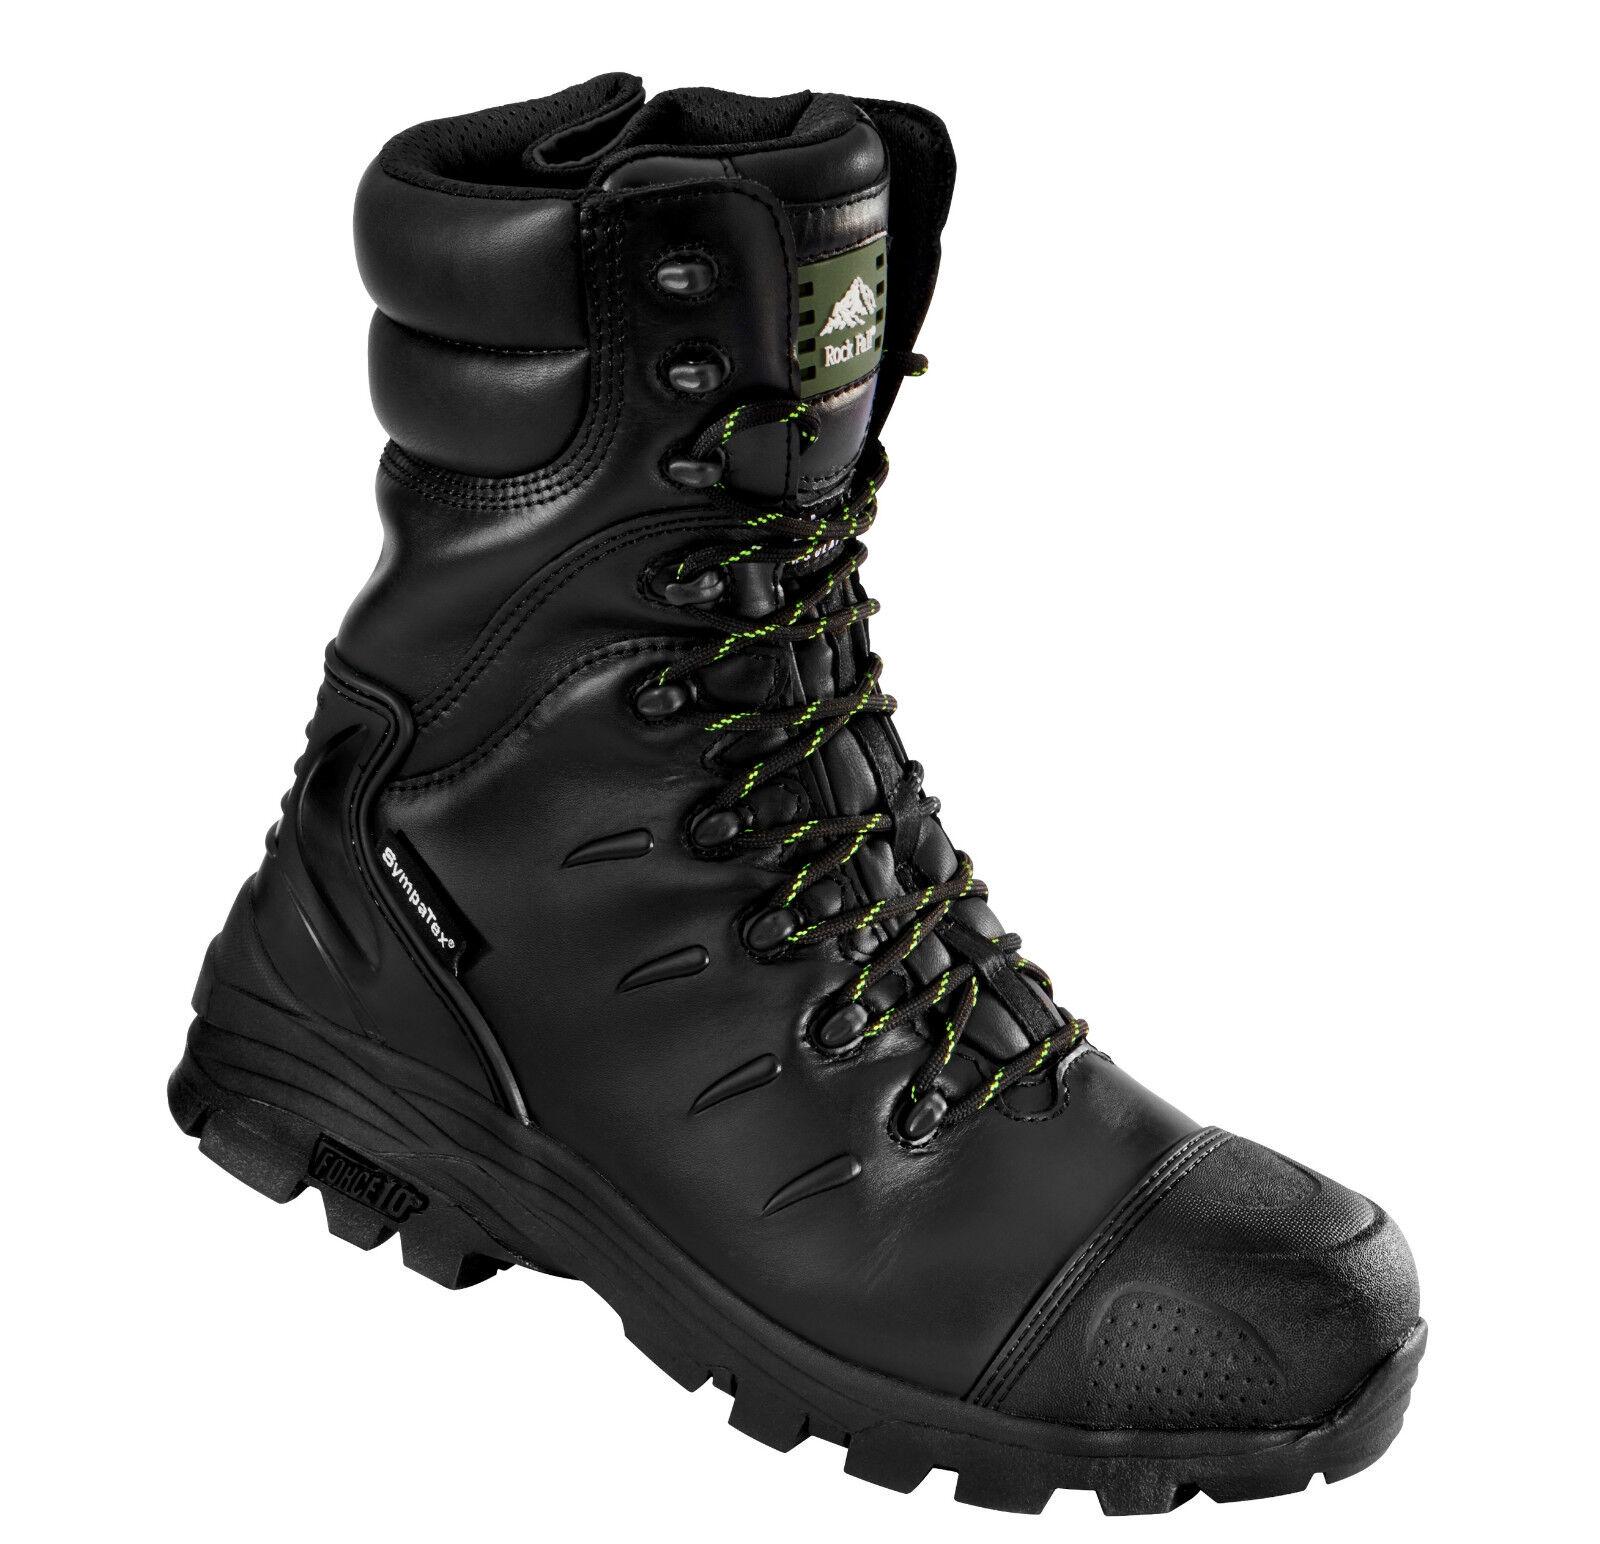 9c3953b48a1 Rock Fall Monzonite Black S3 M HRO SRC Composite Toe Cap Waterproof Safety  Boots